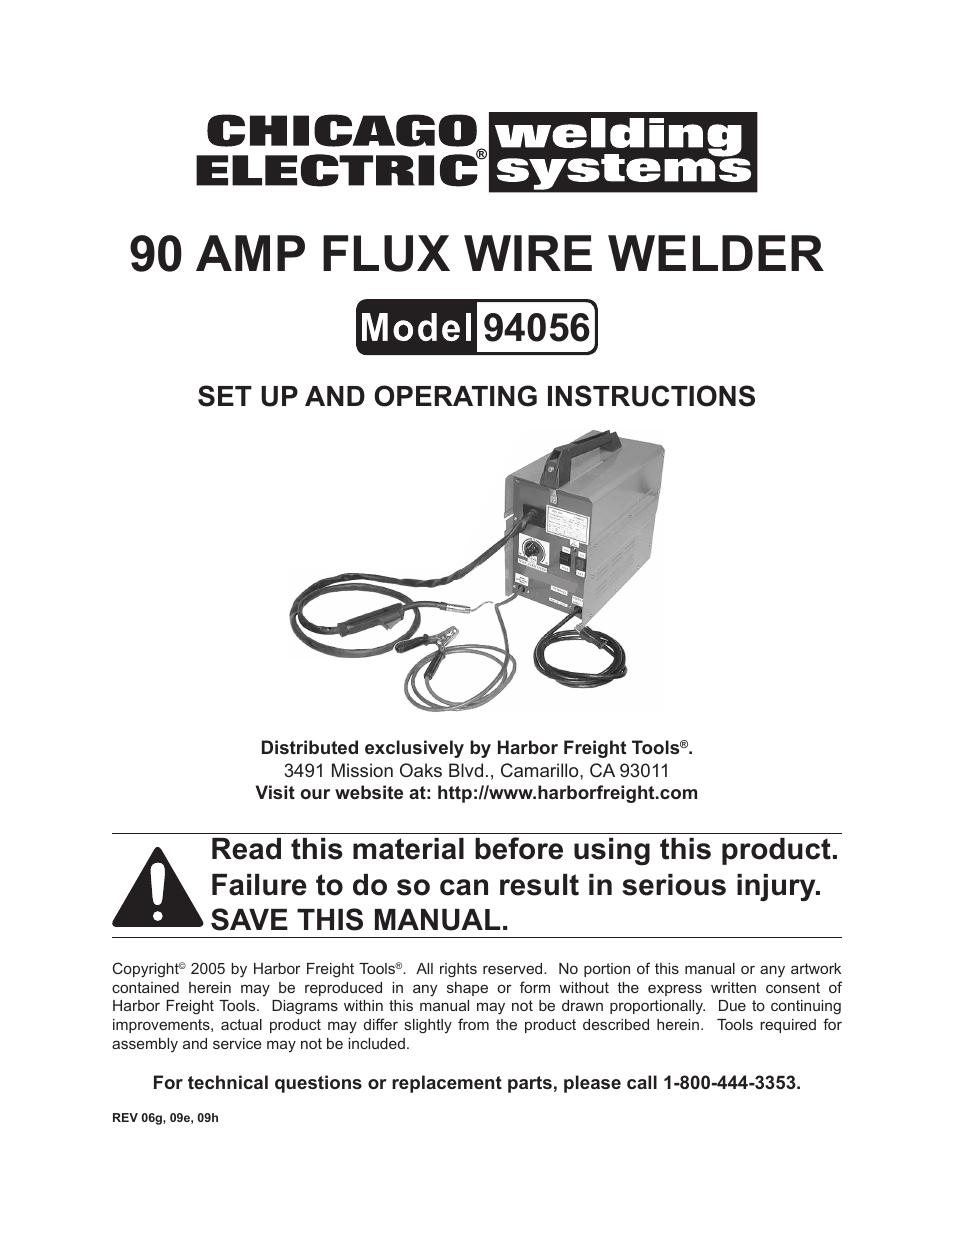 Parts For Chicago Electric Mig Welder Diagram Excellent Electrical Craftsman 85 Amp Model 93420111 100 94056 User Manual 14 Pages Rh Manualsdir Com 180 Welders Dual